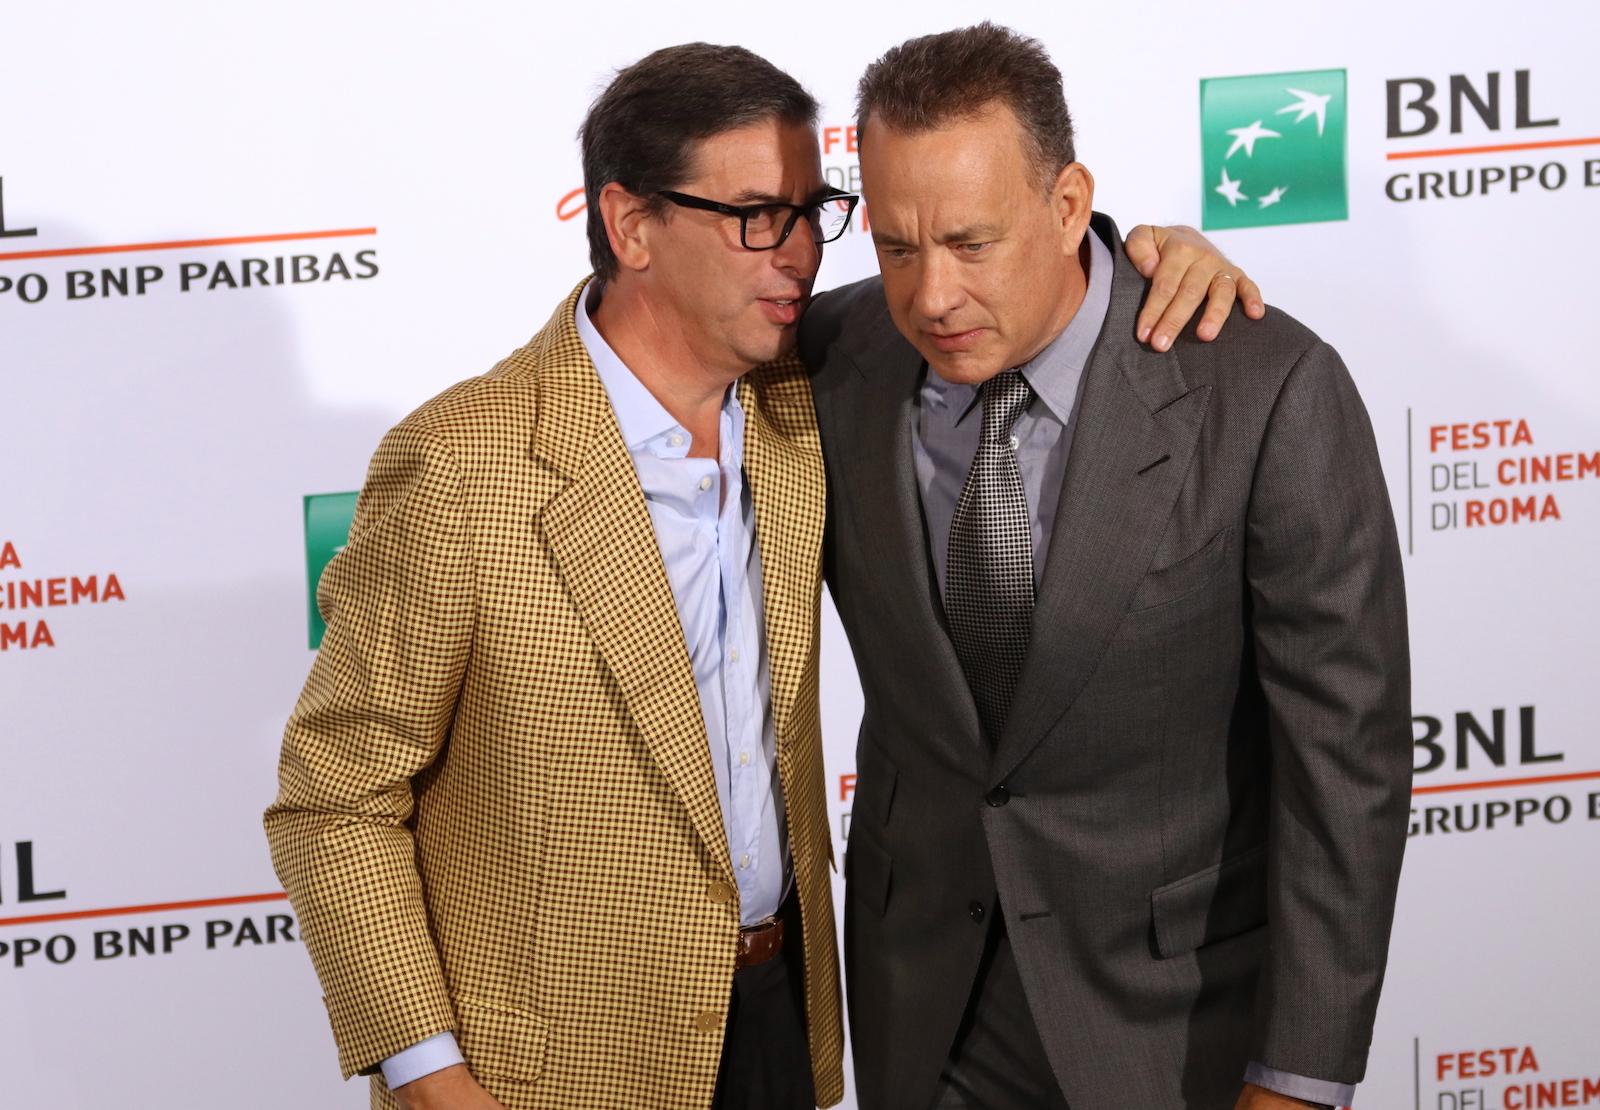 Roma 2016: Tom Hanks insieme ad Antonio Monda al photocall